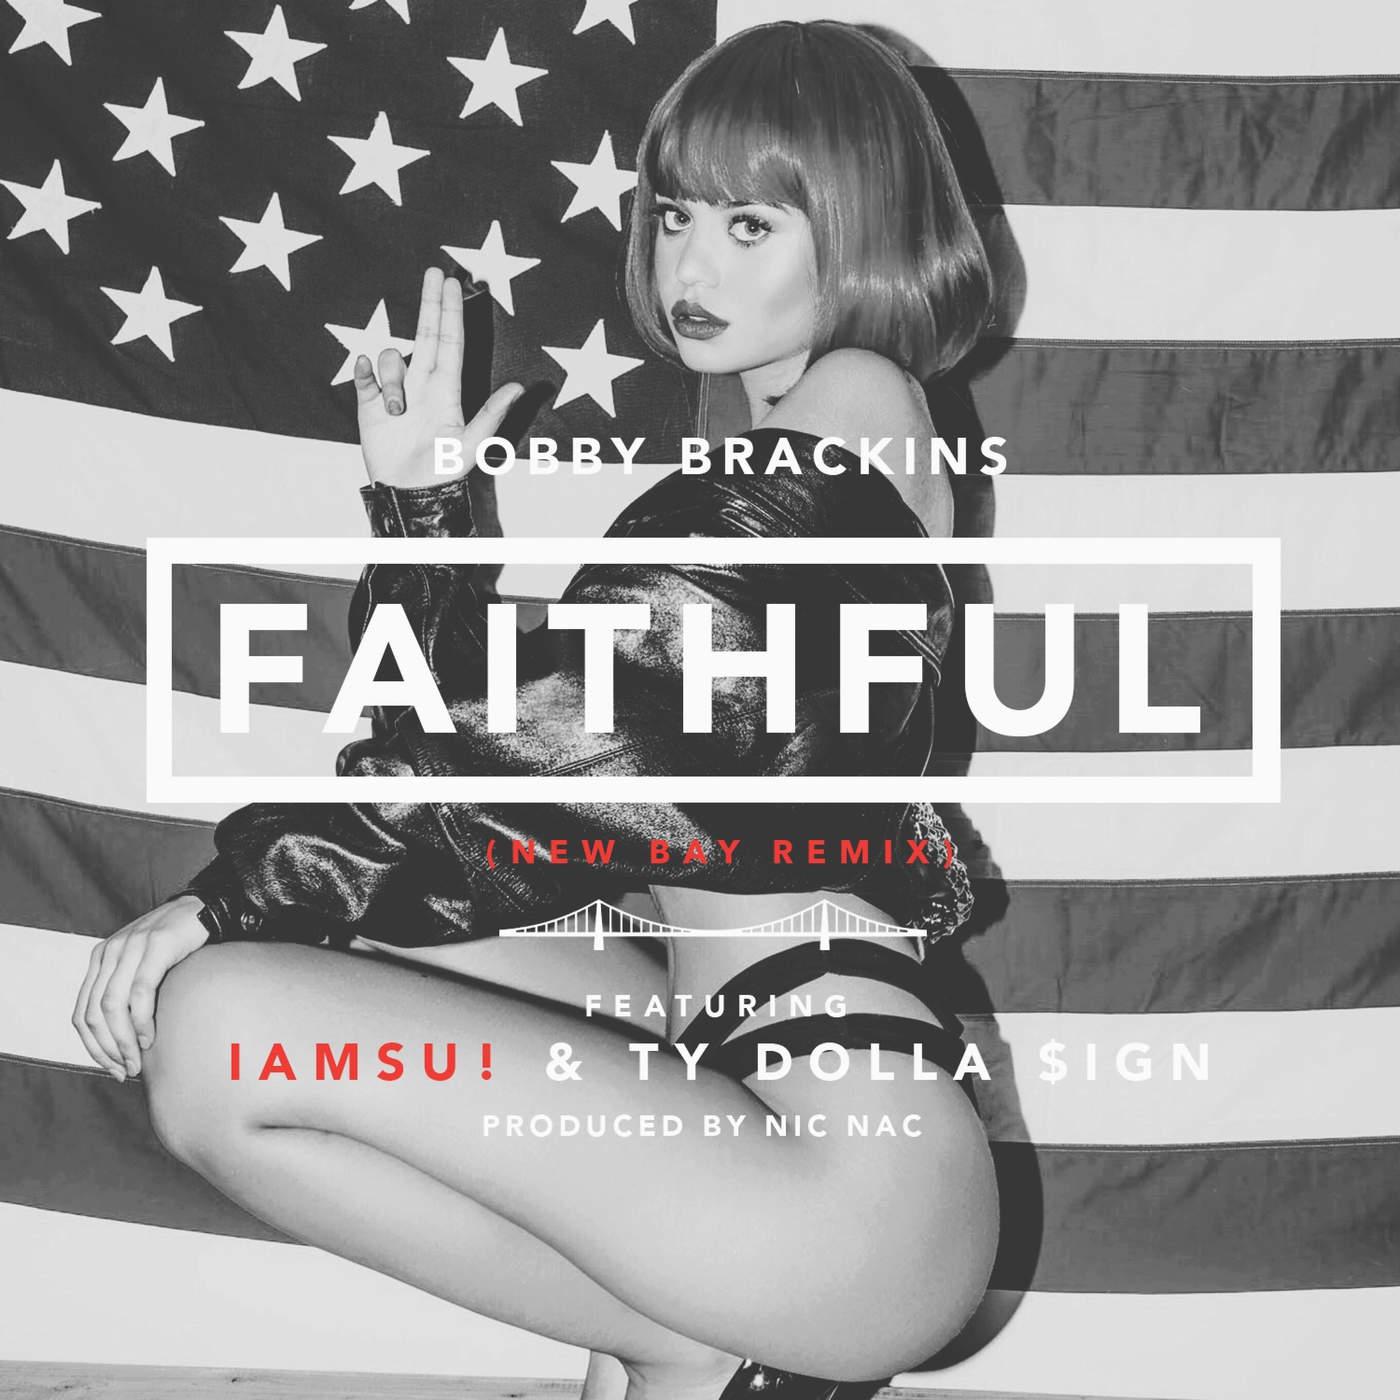 Bobby Brackins - Faithful (Remix) [feat. Iamsu! & Ty Dolla $ign] - Single  Cover